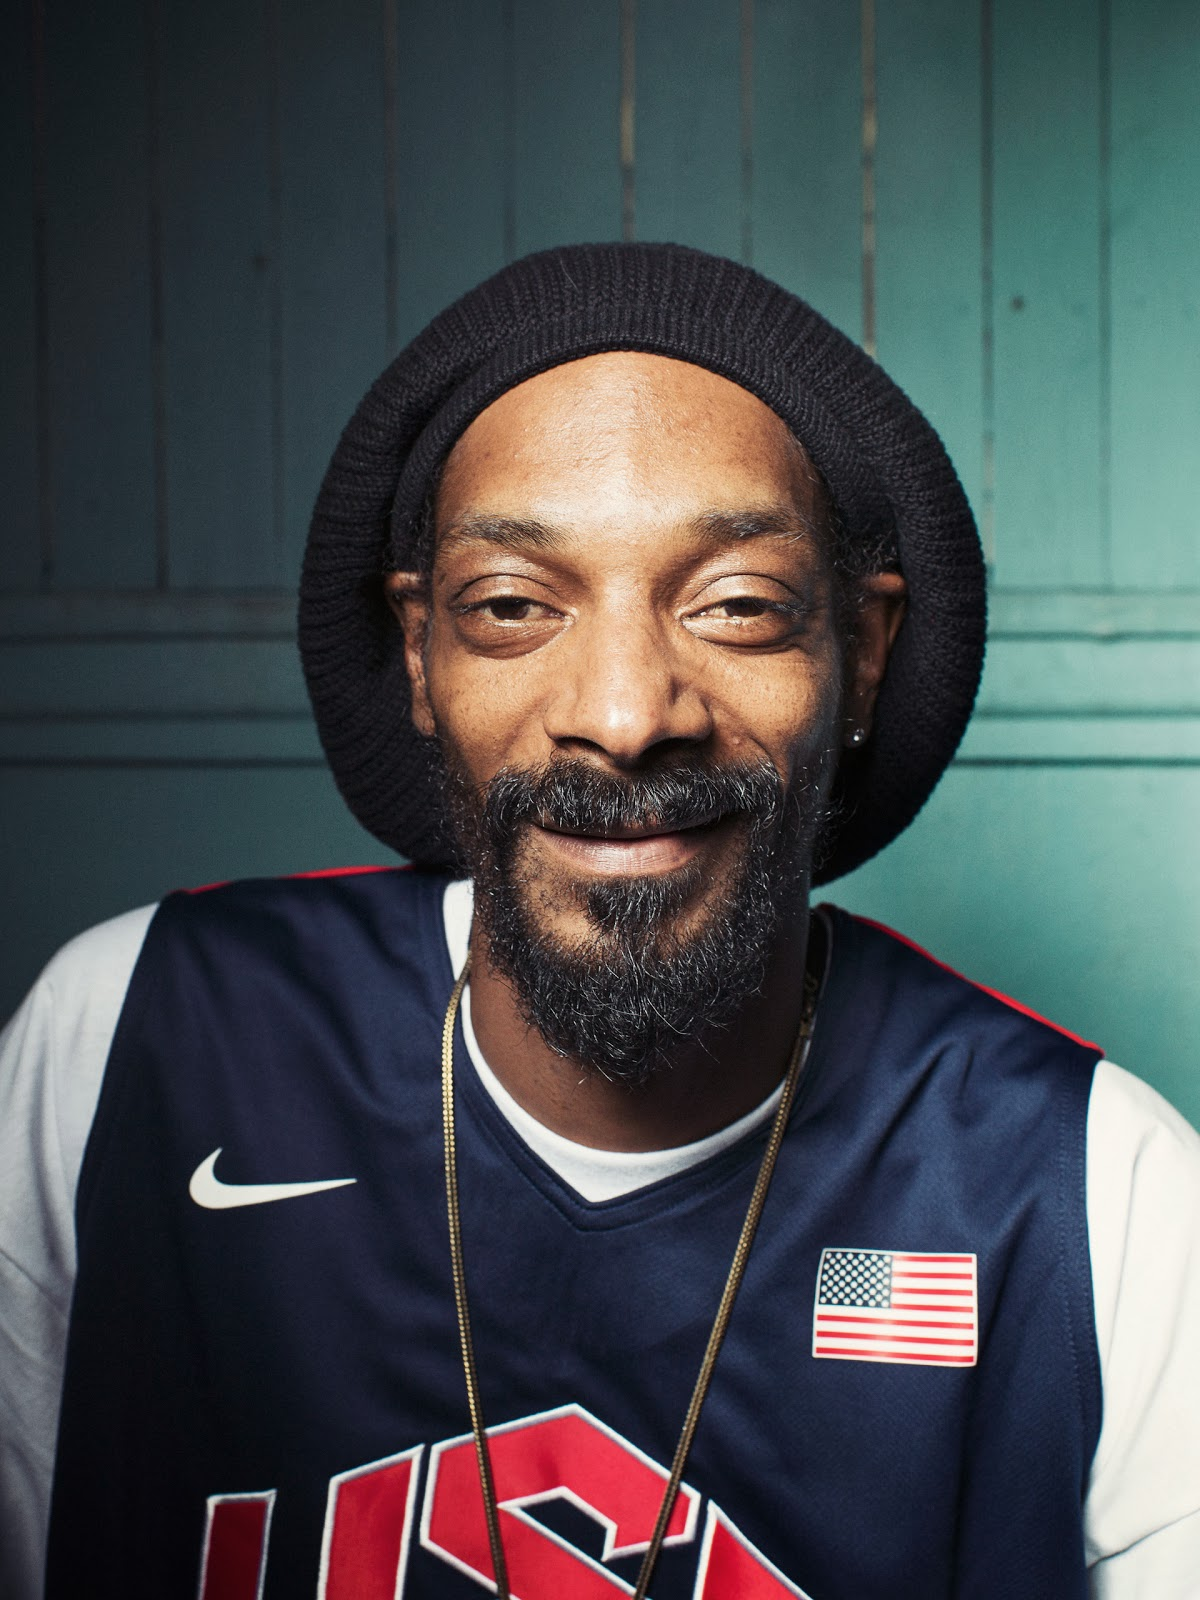 Snoop Dogg & Dam-Funk (7 Days Of Funk) Interview On BBC